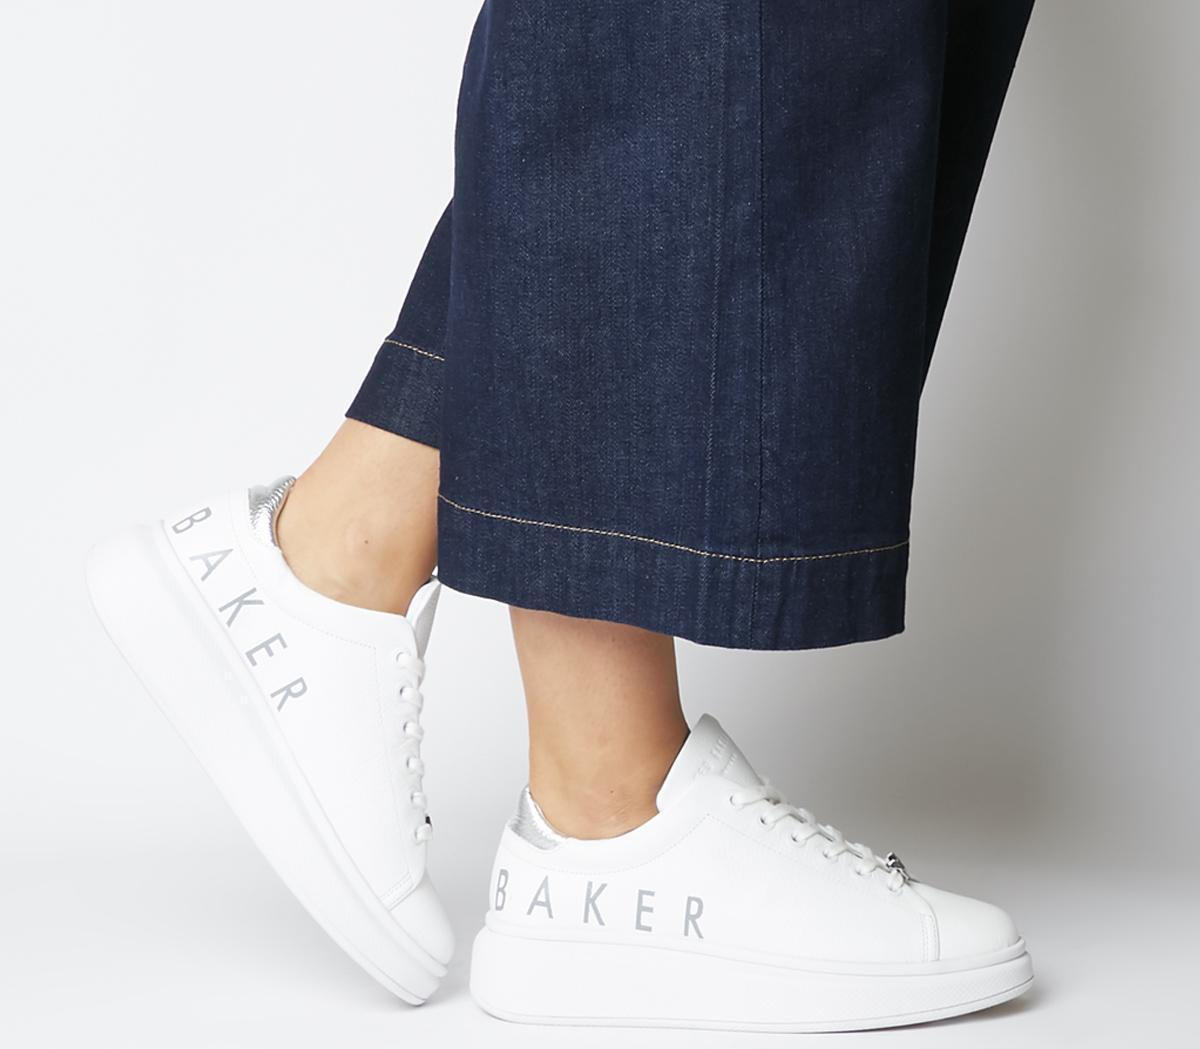 Ted Baker Ailbaa Sneakers White - Flats